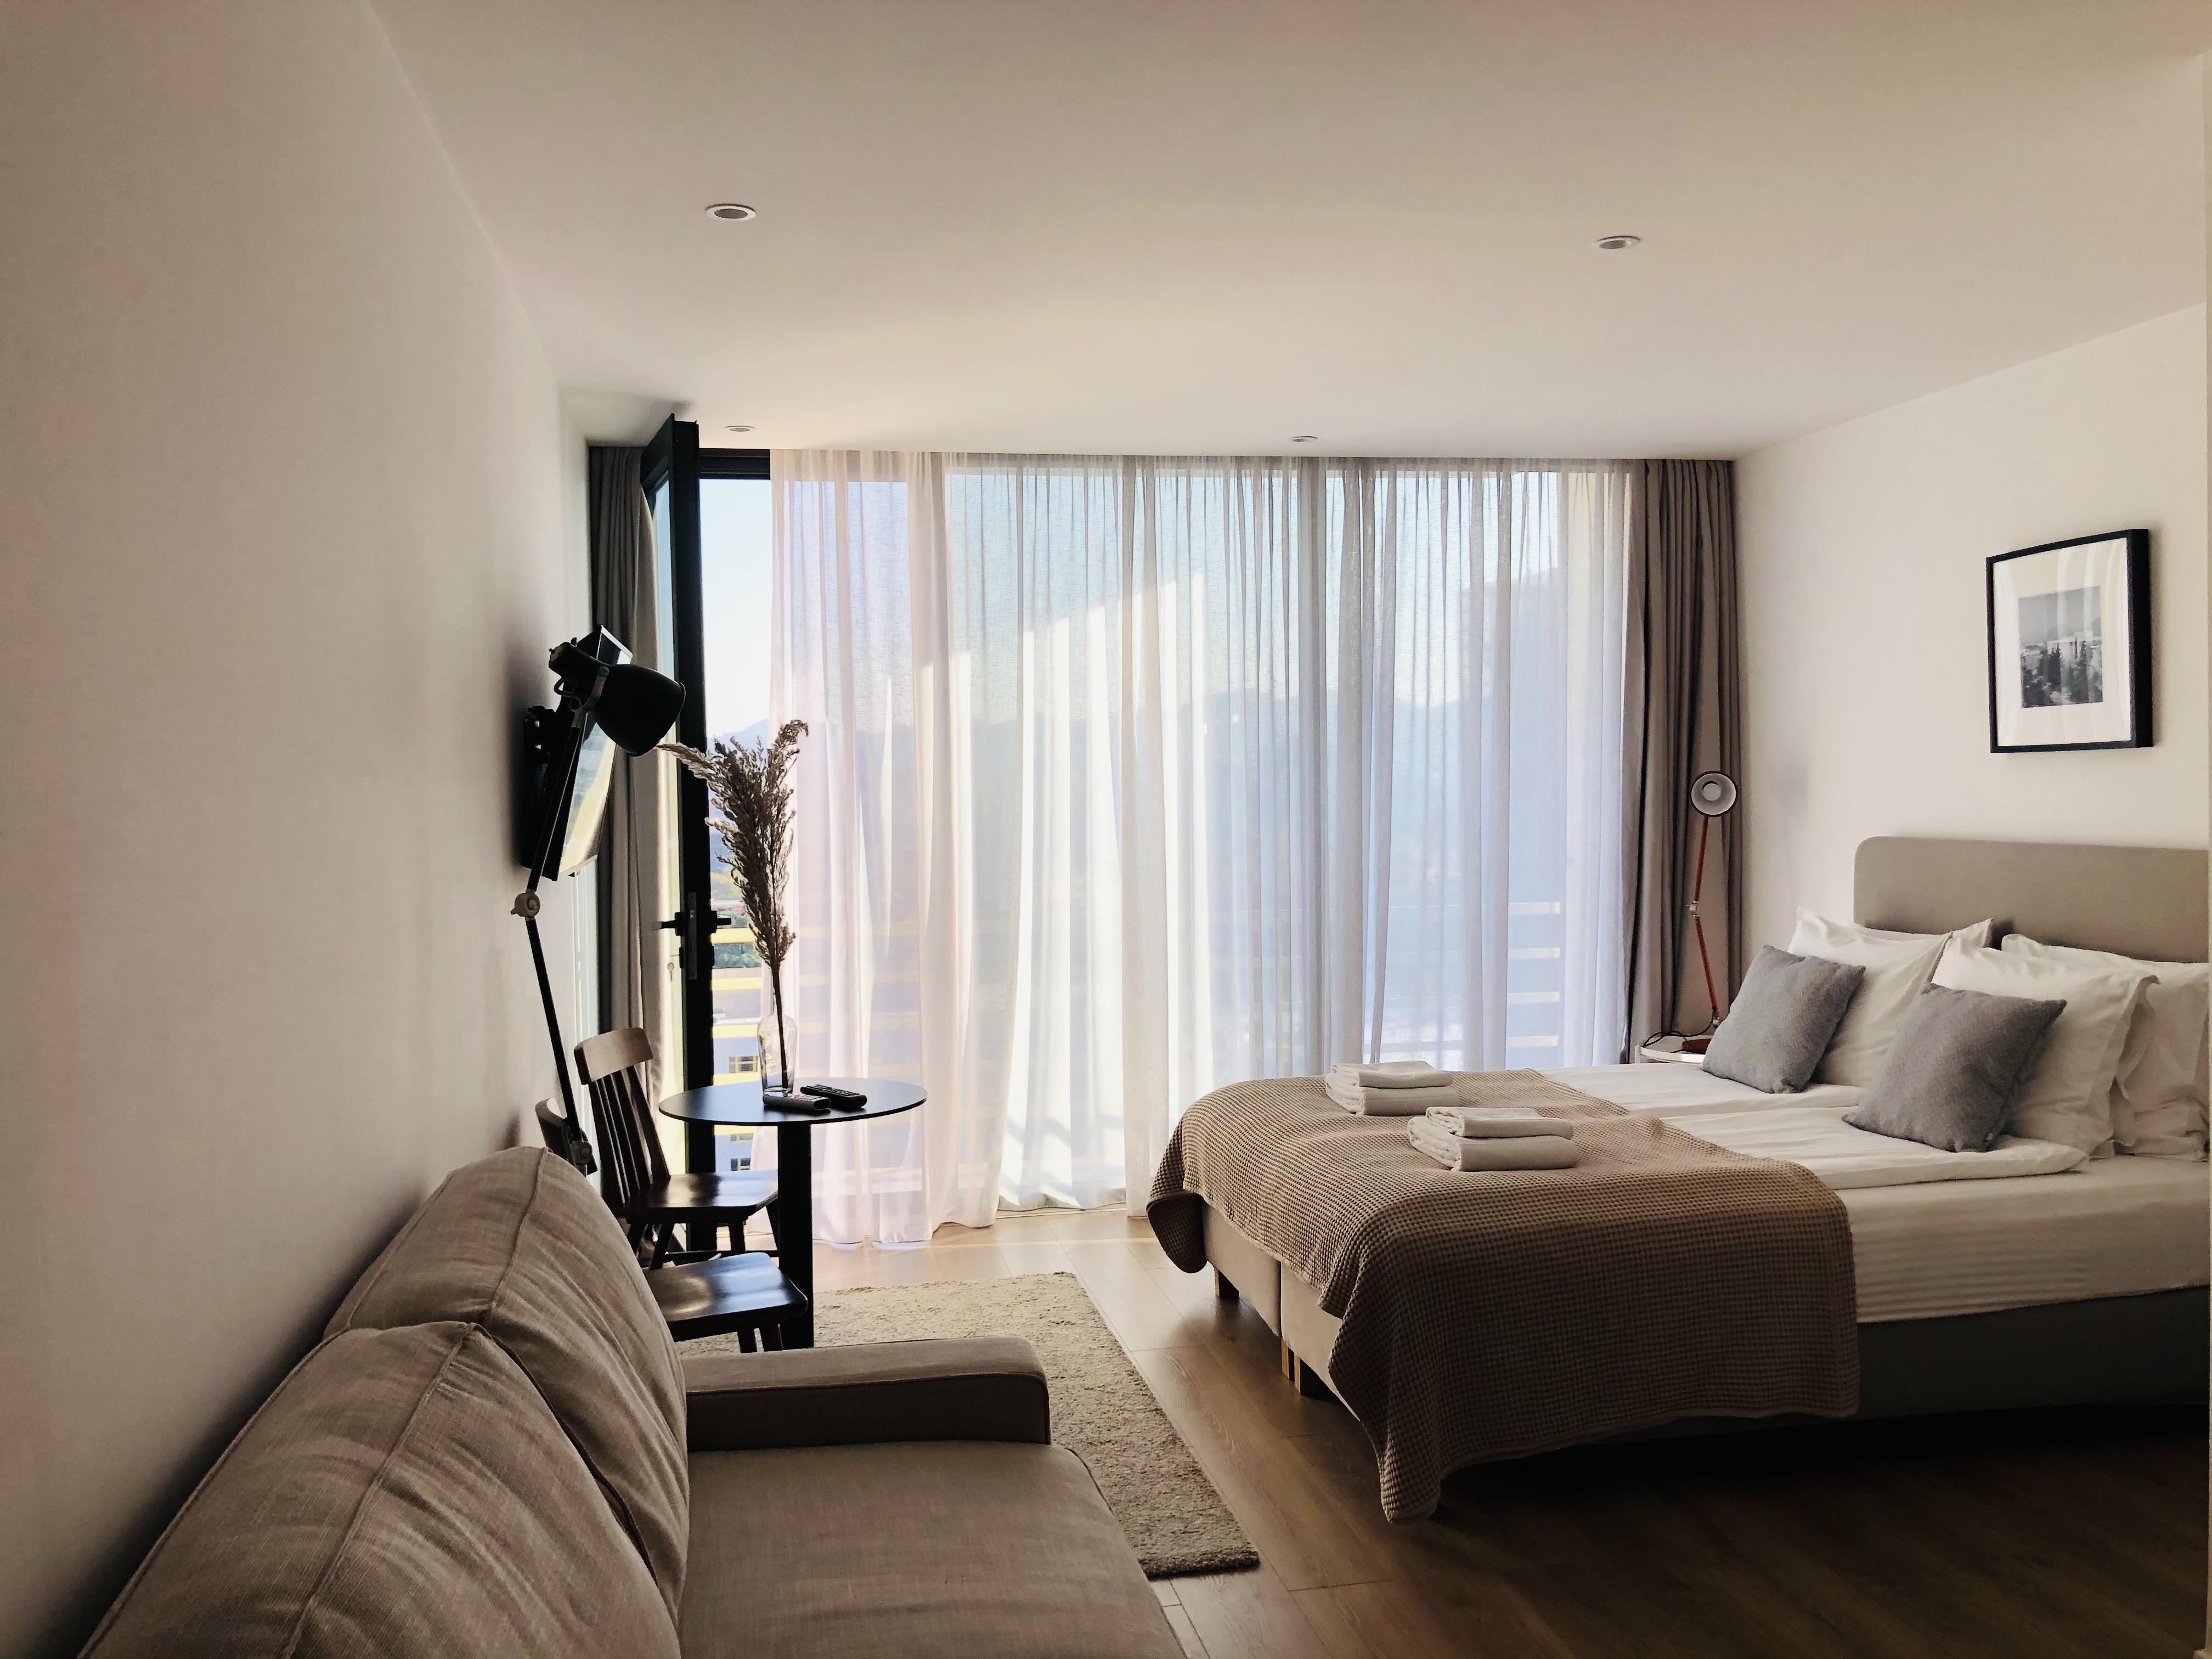 Apartamente me qira ditore ne qender te Tiranes